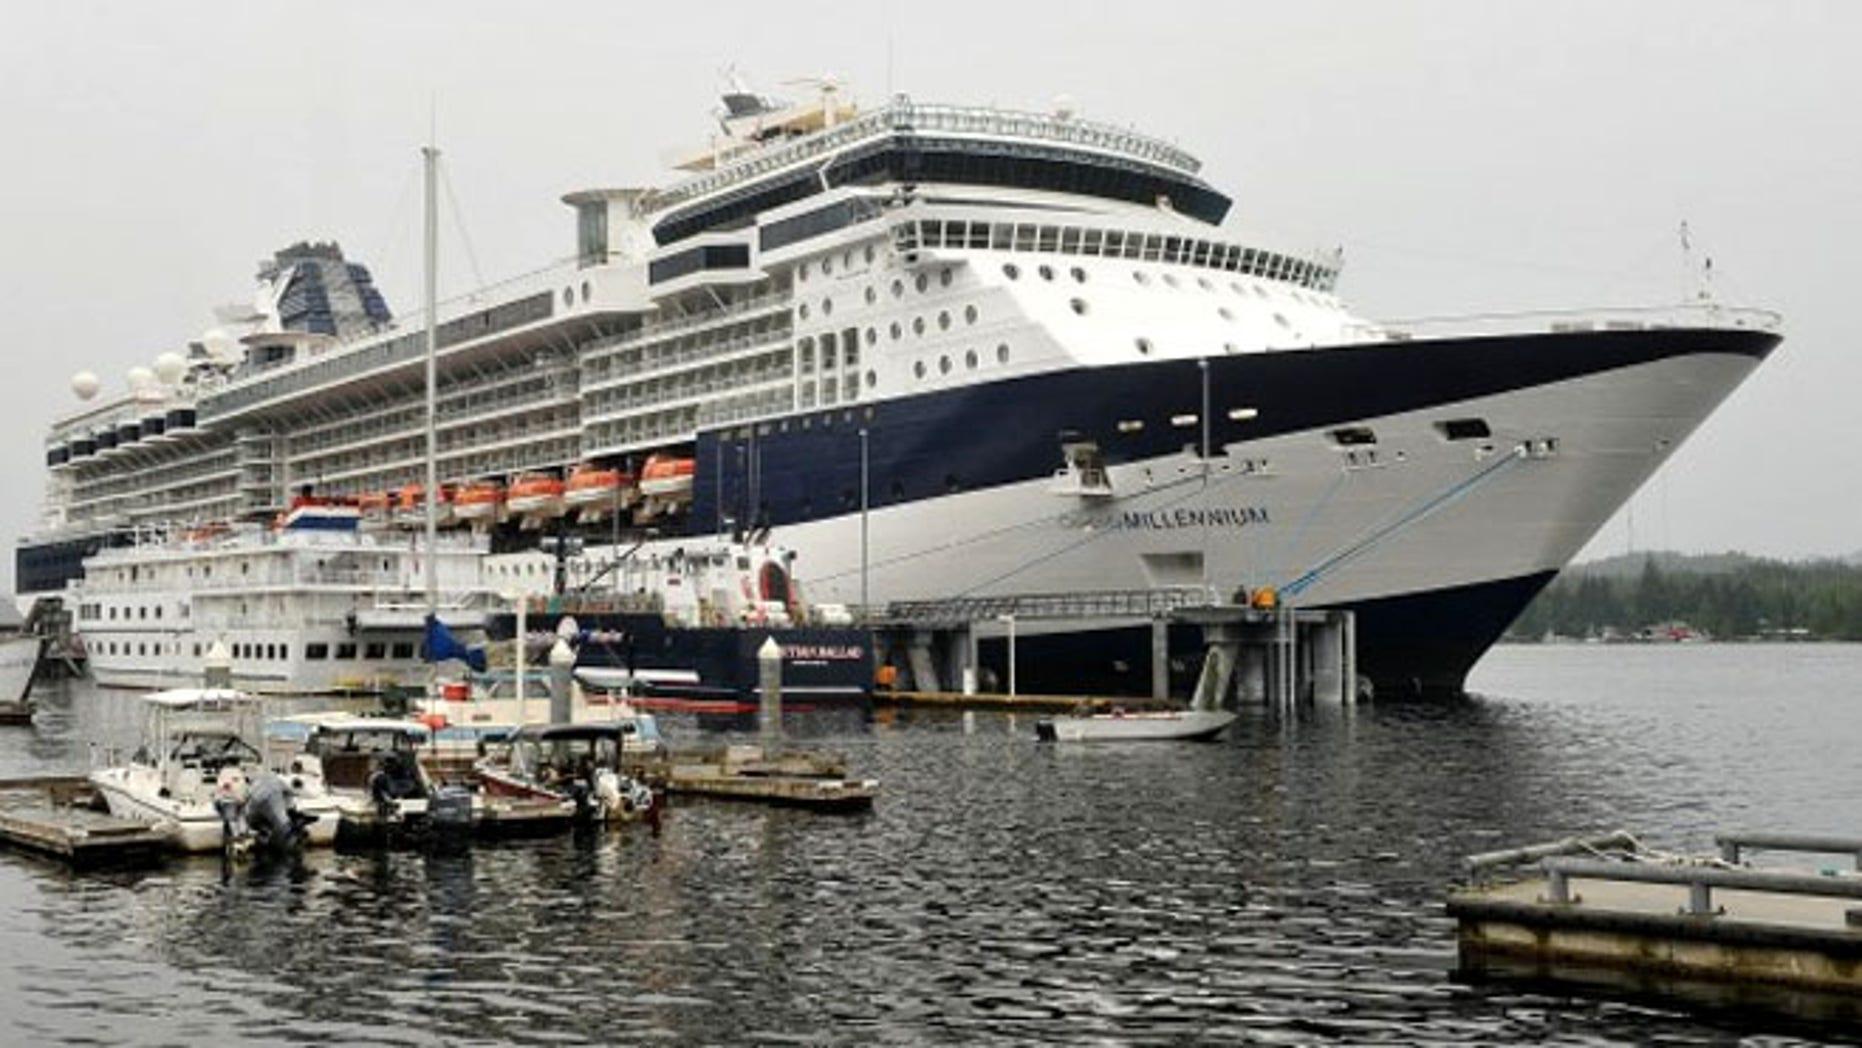 Celebrity Cruise's Millennium in Ketchikan, Alaska